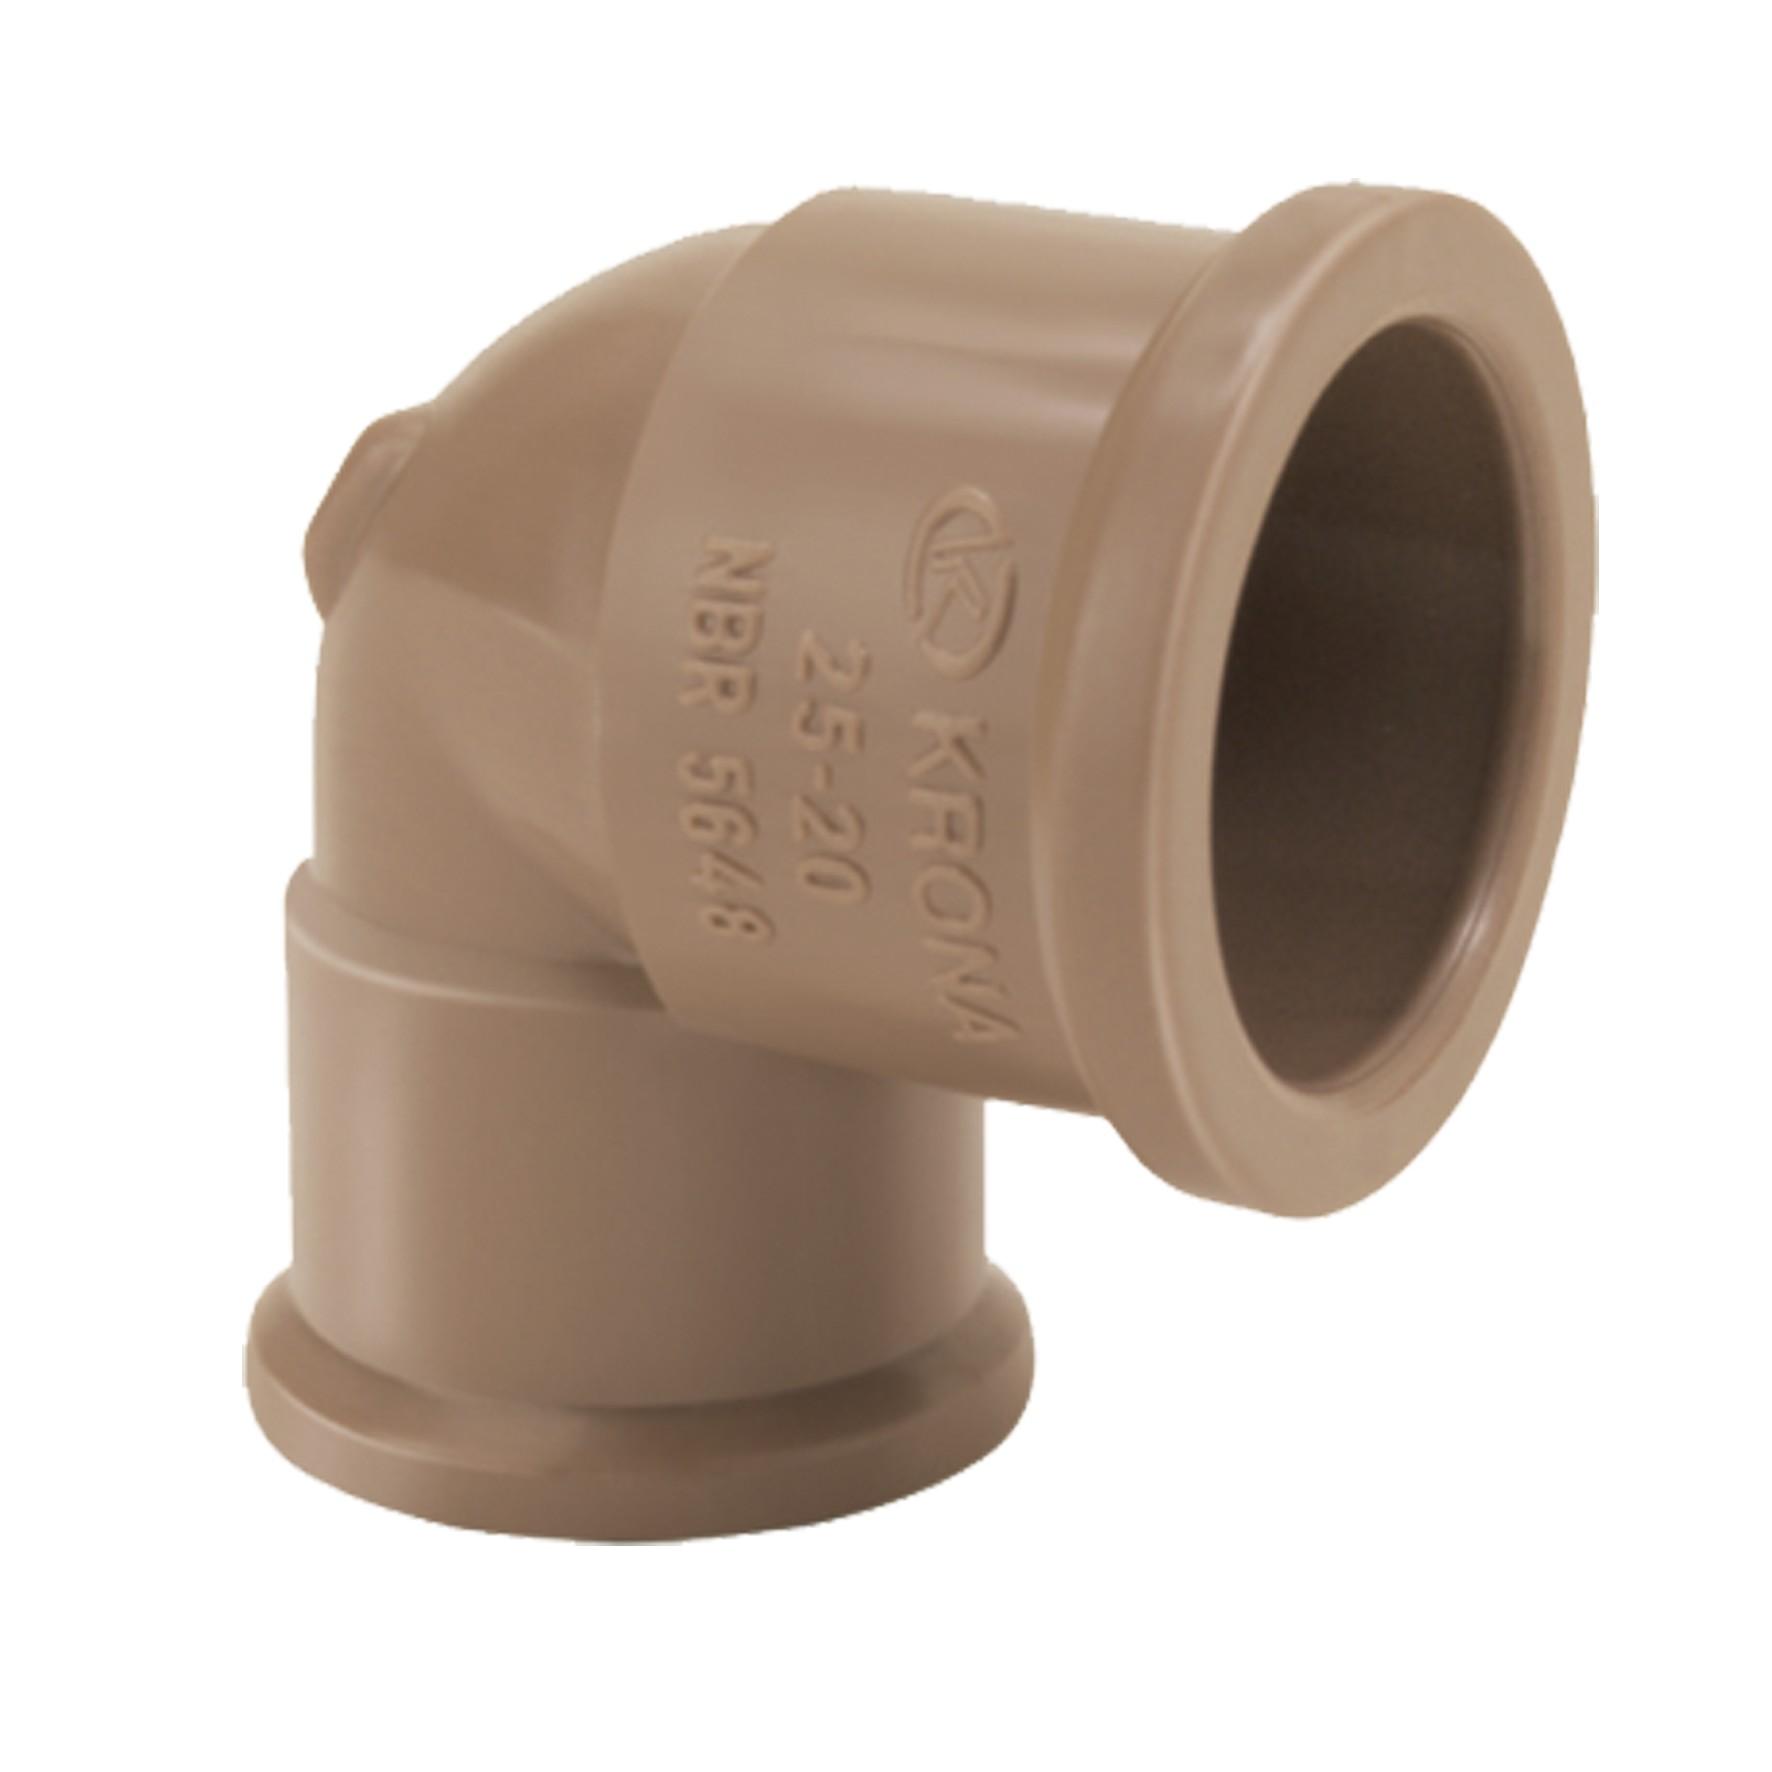 Joelho Simples Soldavel PVC 32x25 mm - Krona